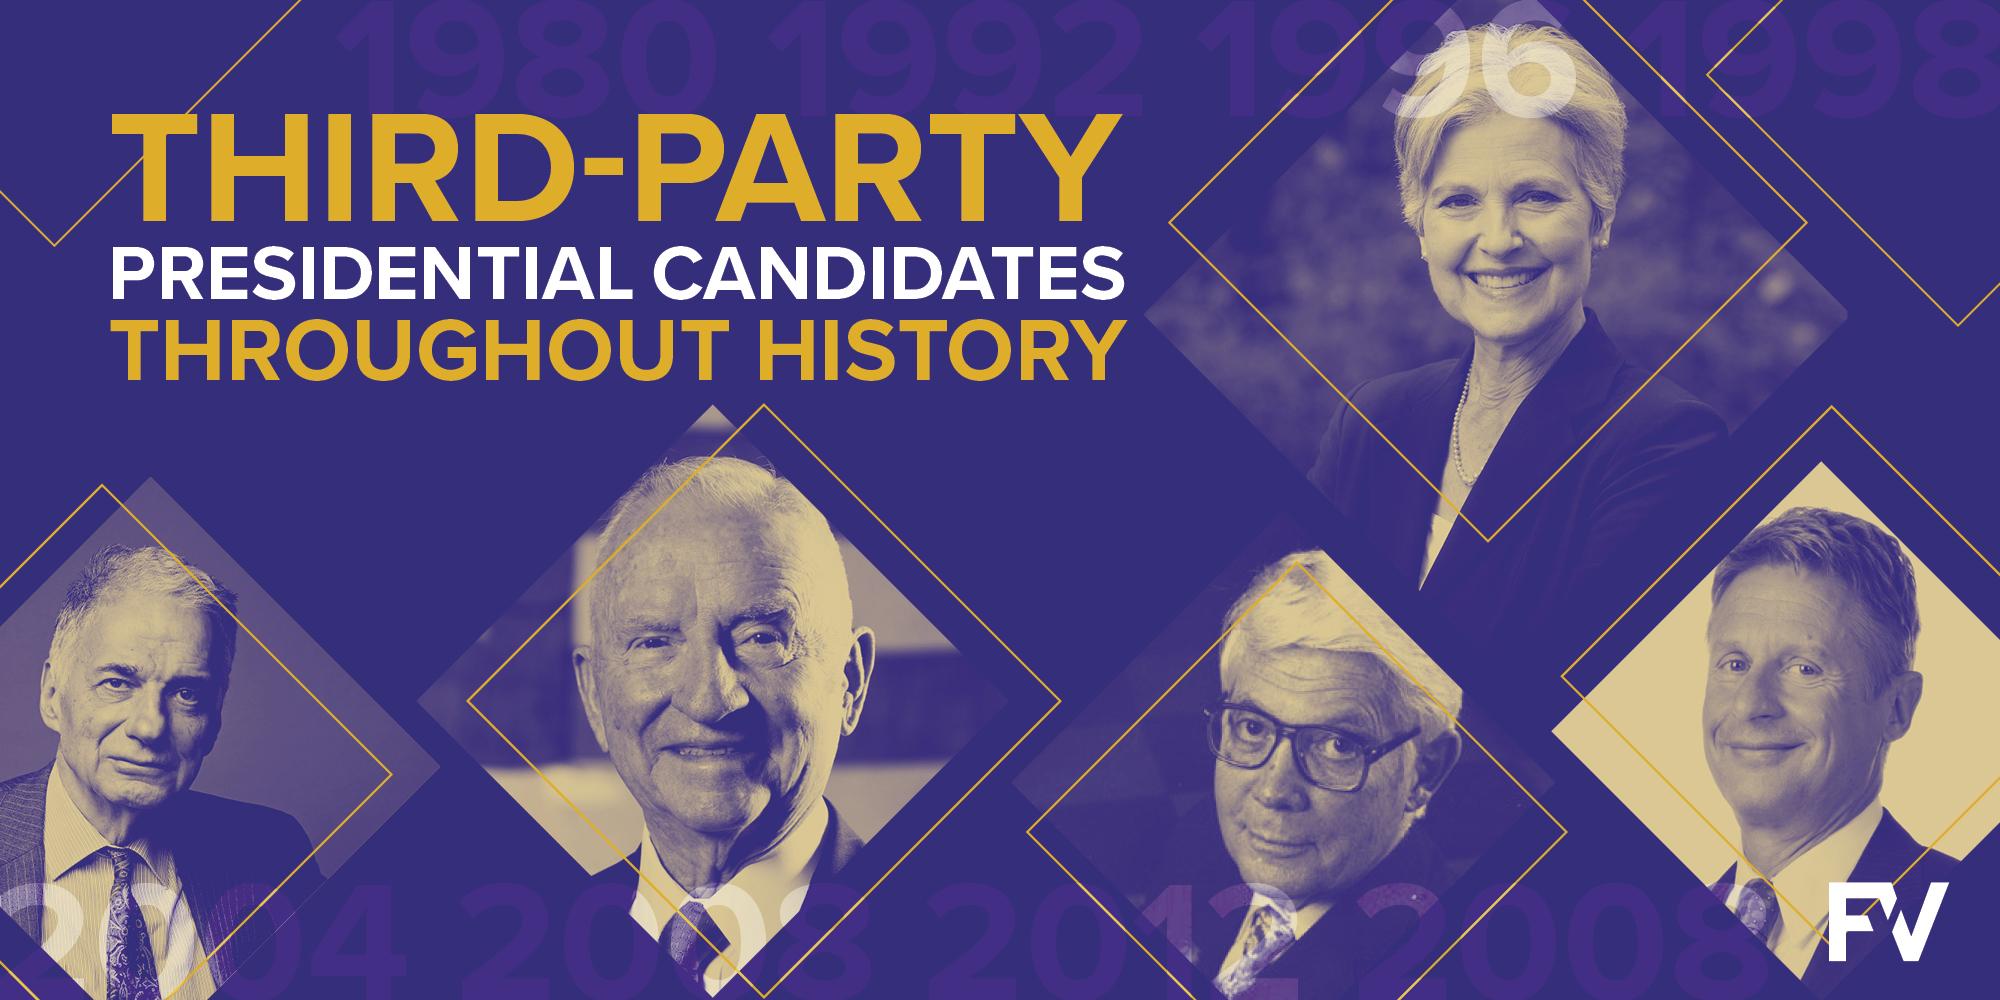 FV Third Party Candidates d1.jpg